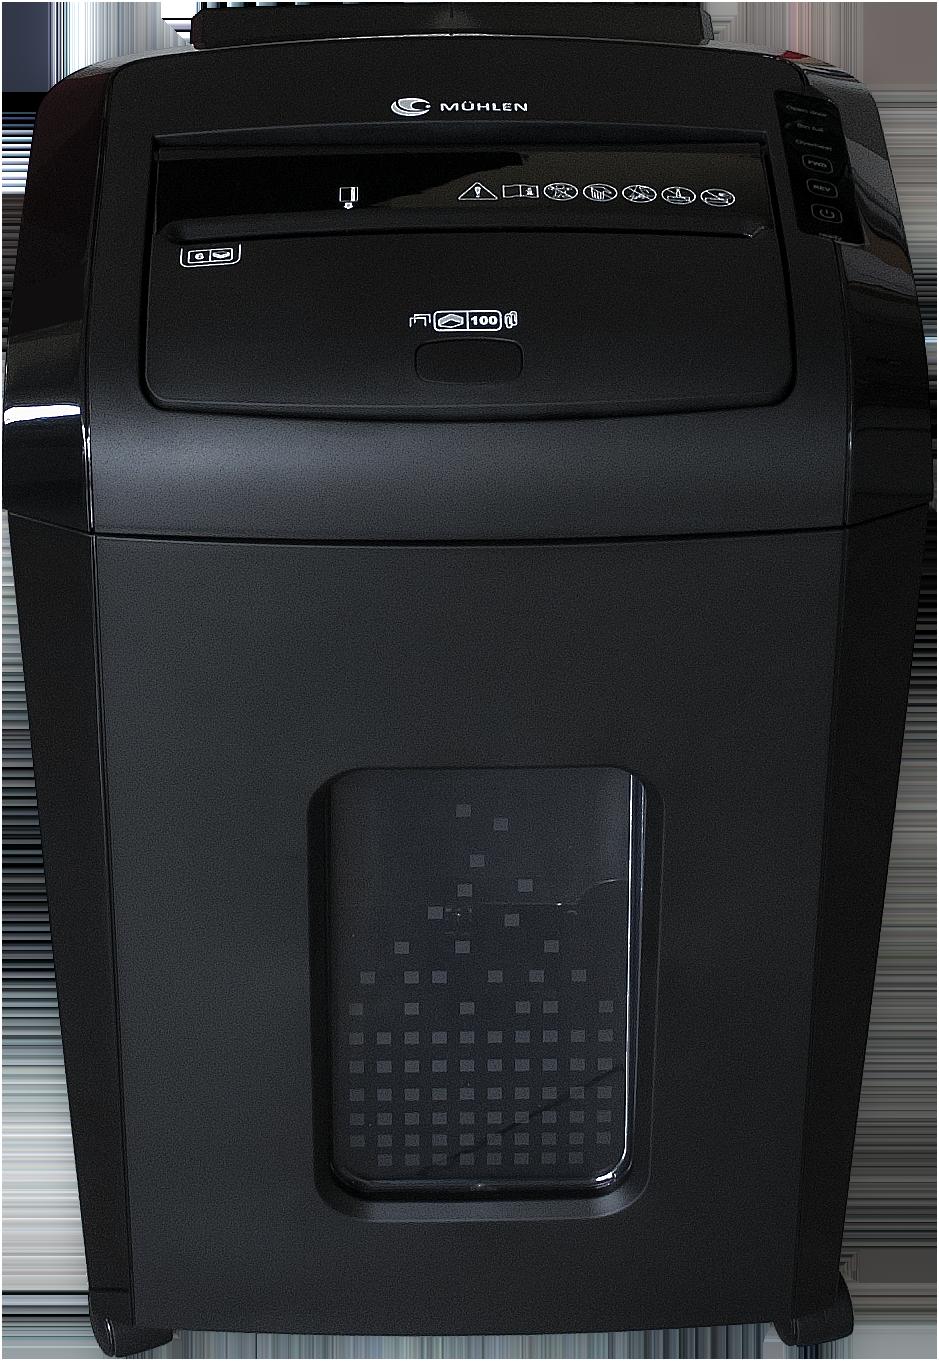 Mühlen VS 100 MA Otomatik Beslemeli Evrak İmha Makinesi 8